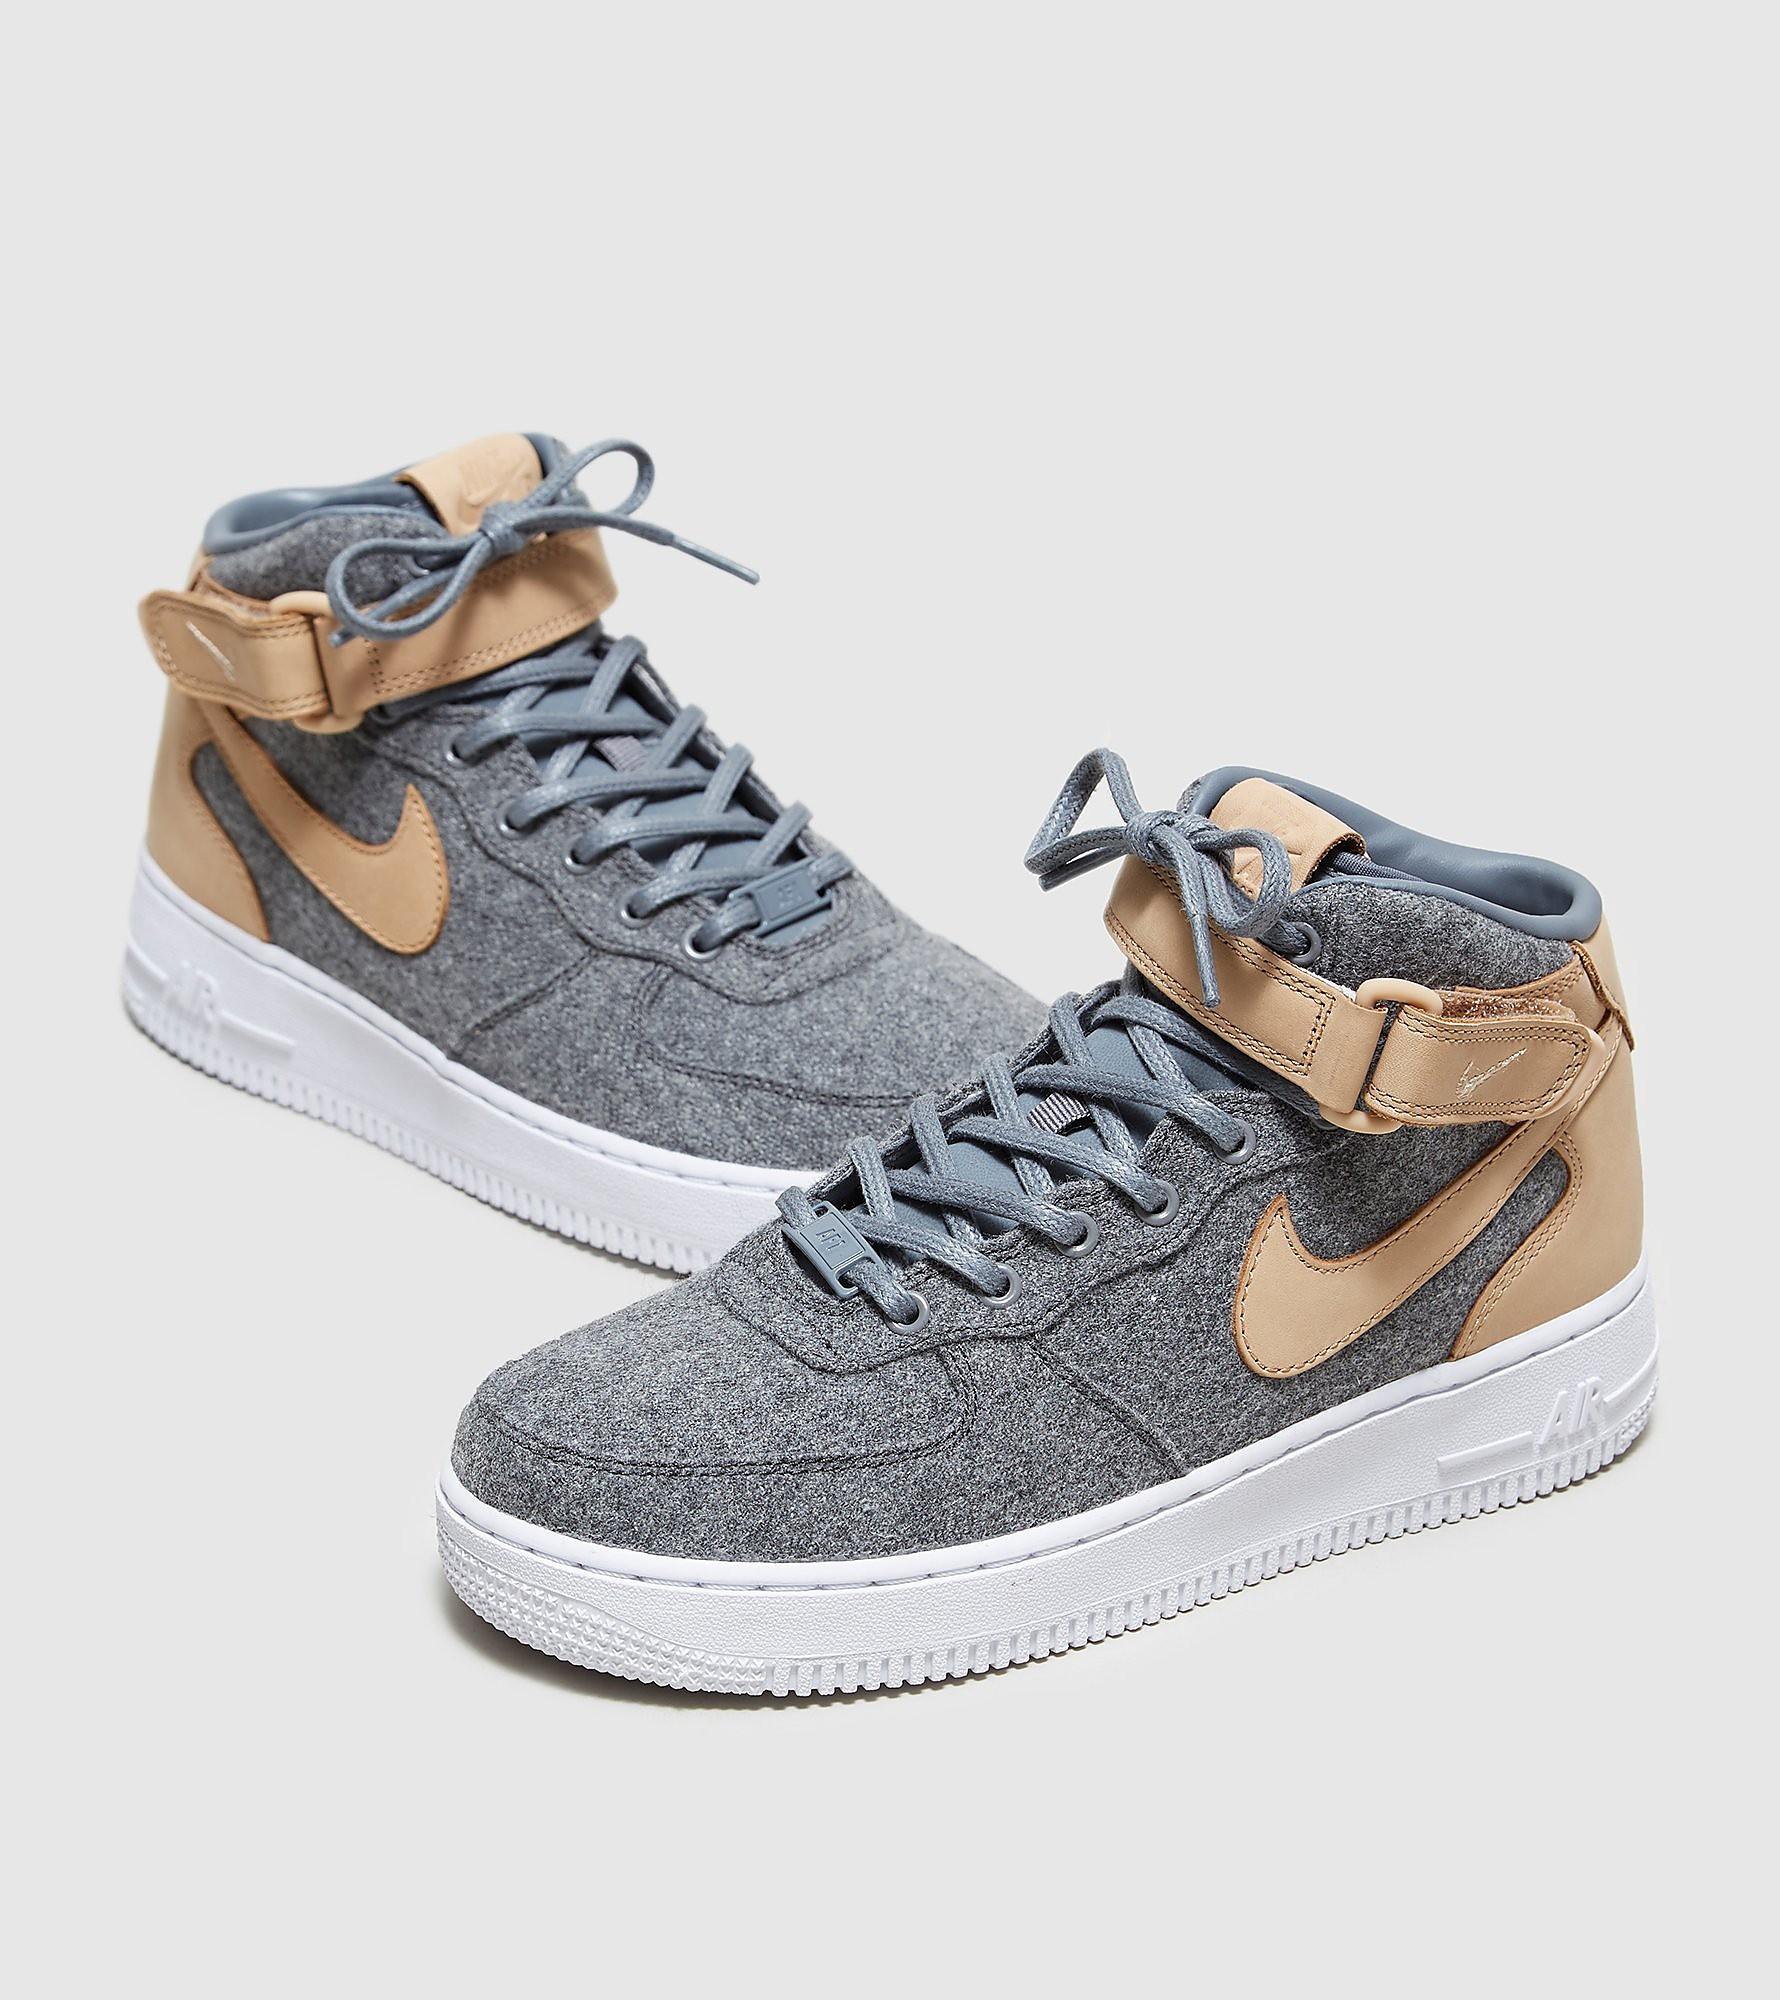 Nike Air Force 1 Mid Premium Women's